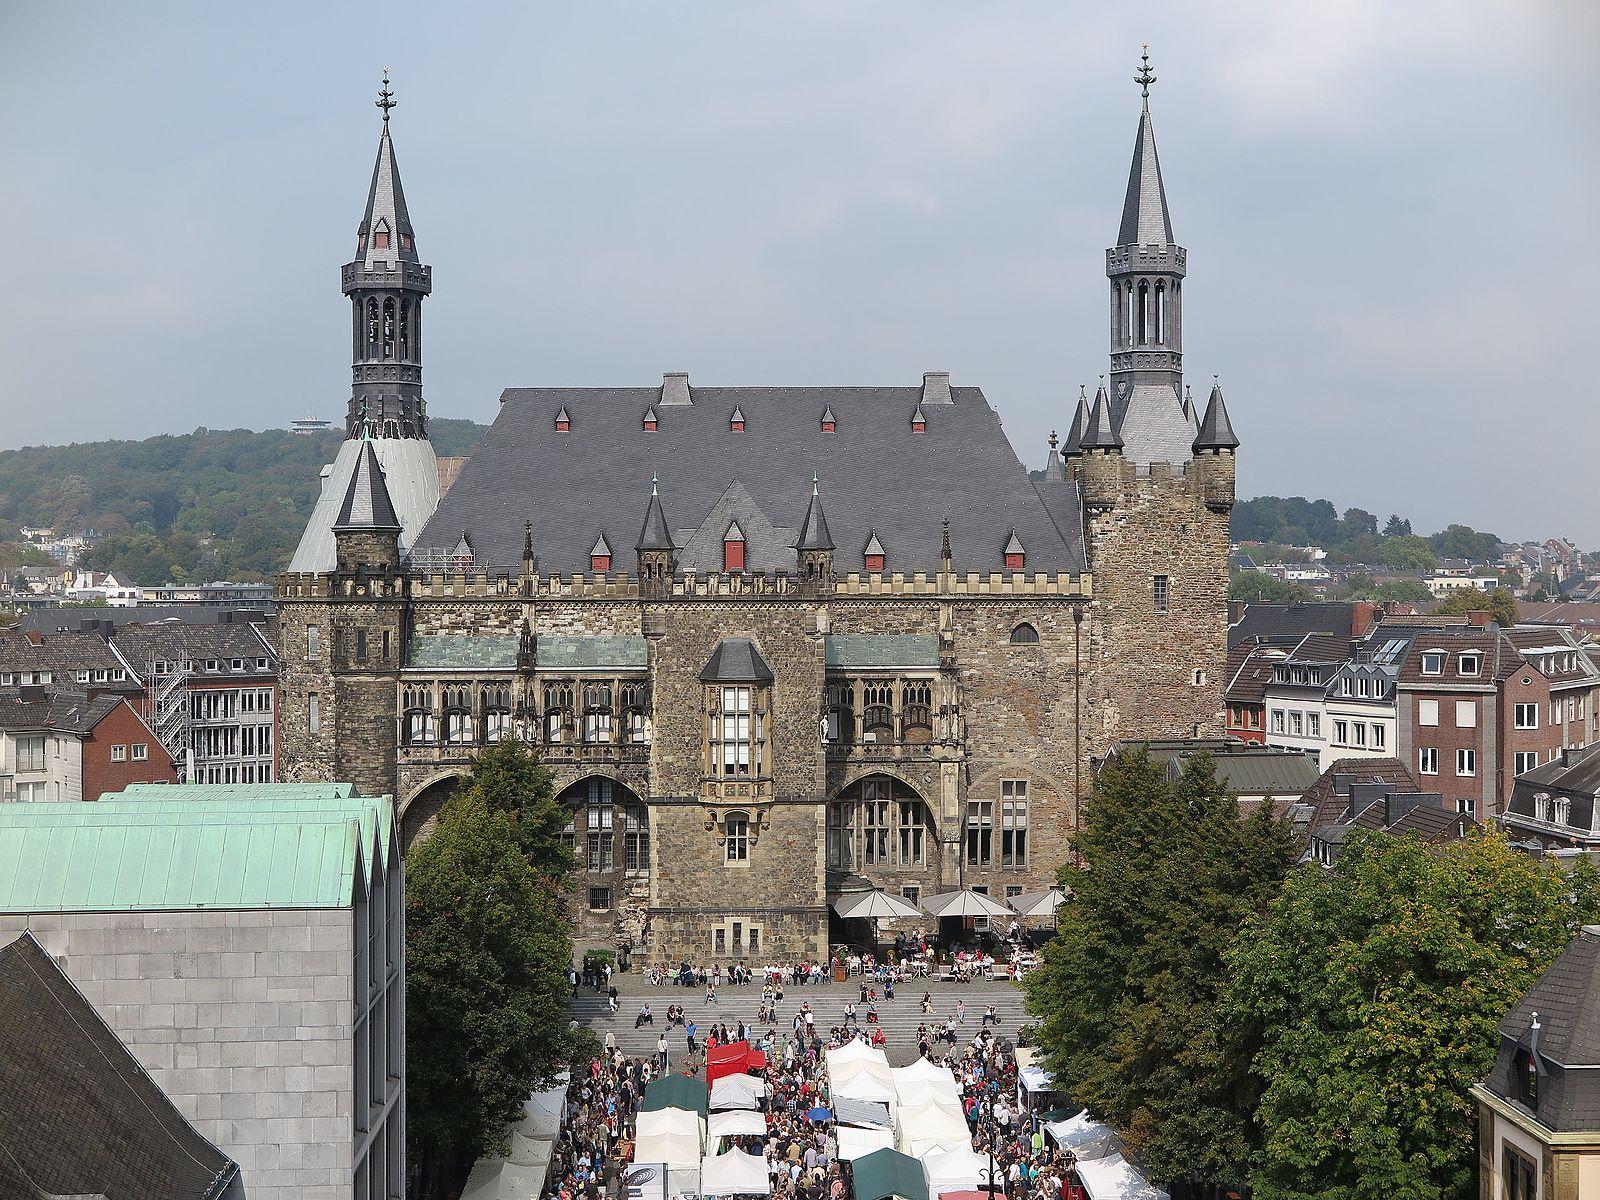 Photograph of the Aachen Rathaus